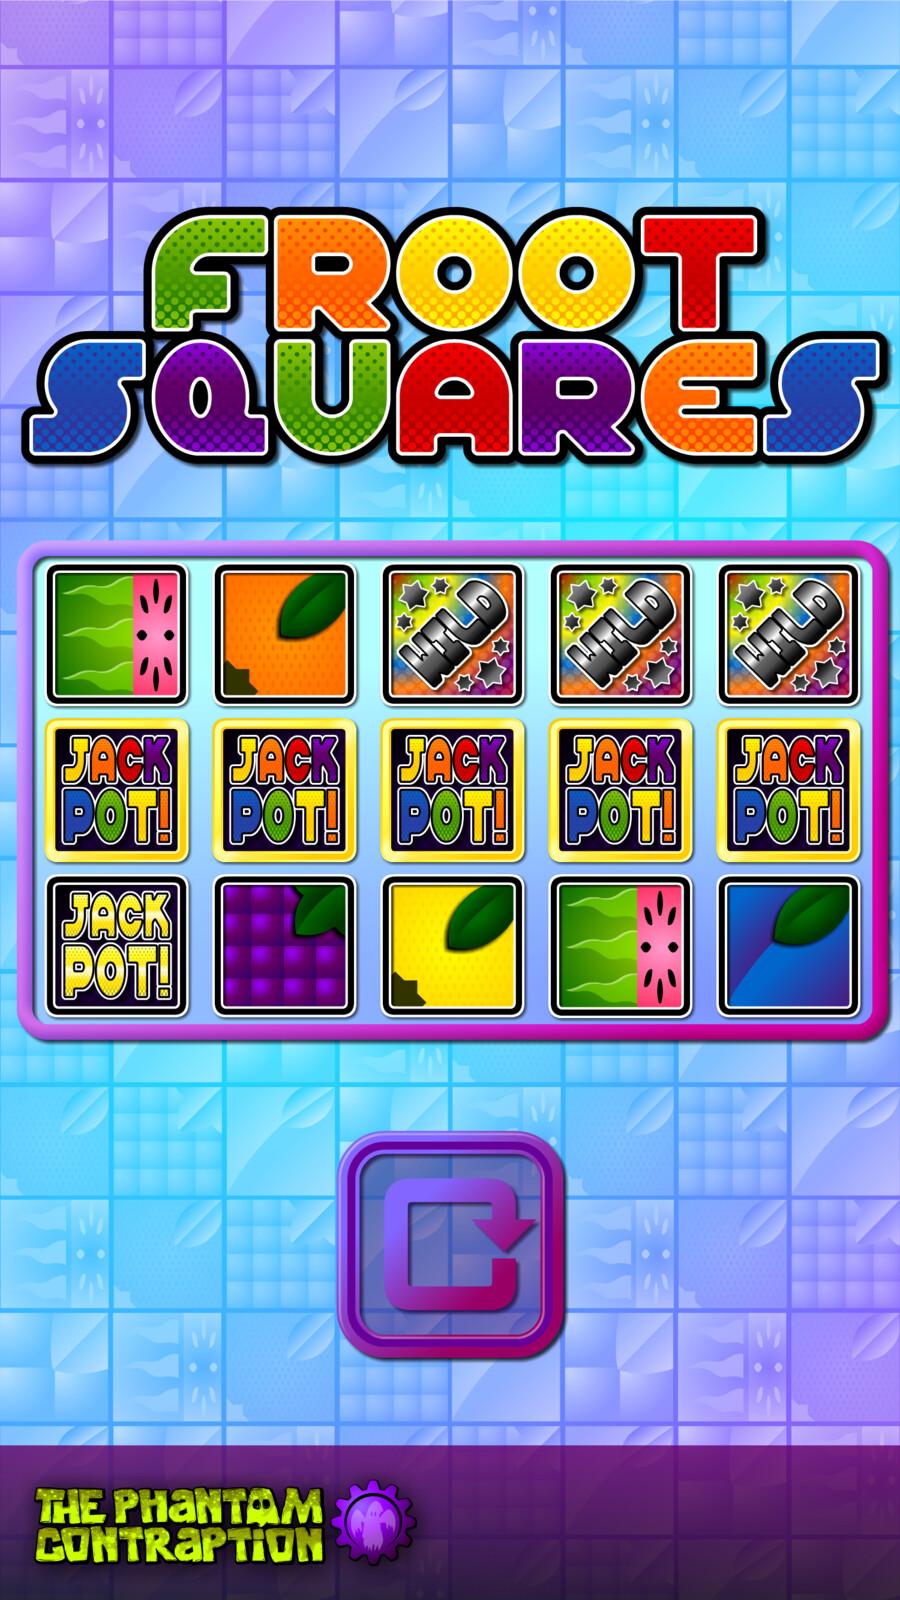 Froot Squares Portrait Screenshot: Jackpot Line